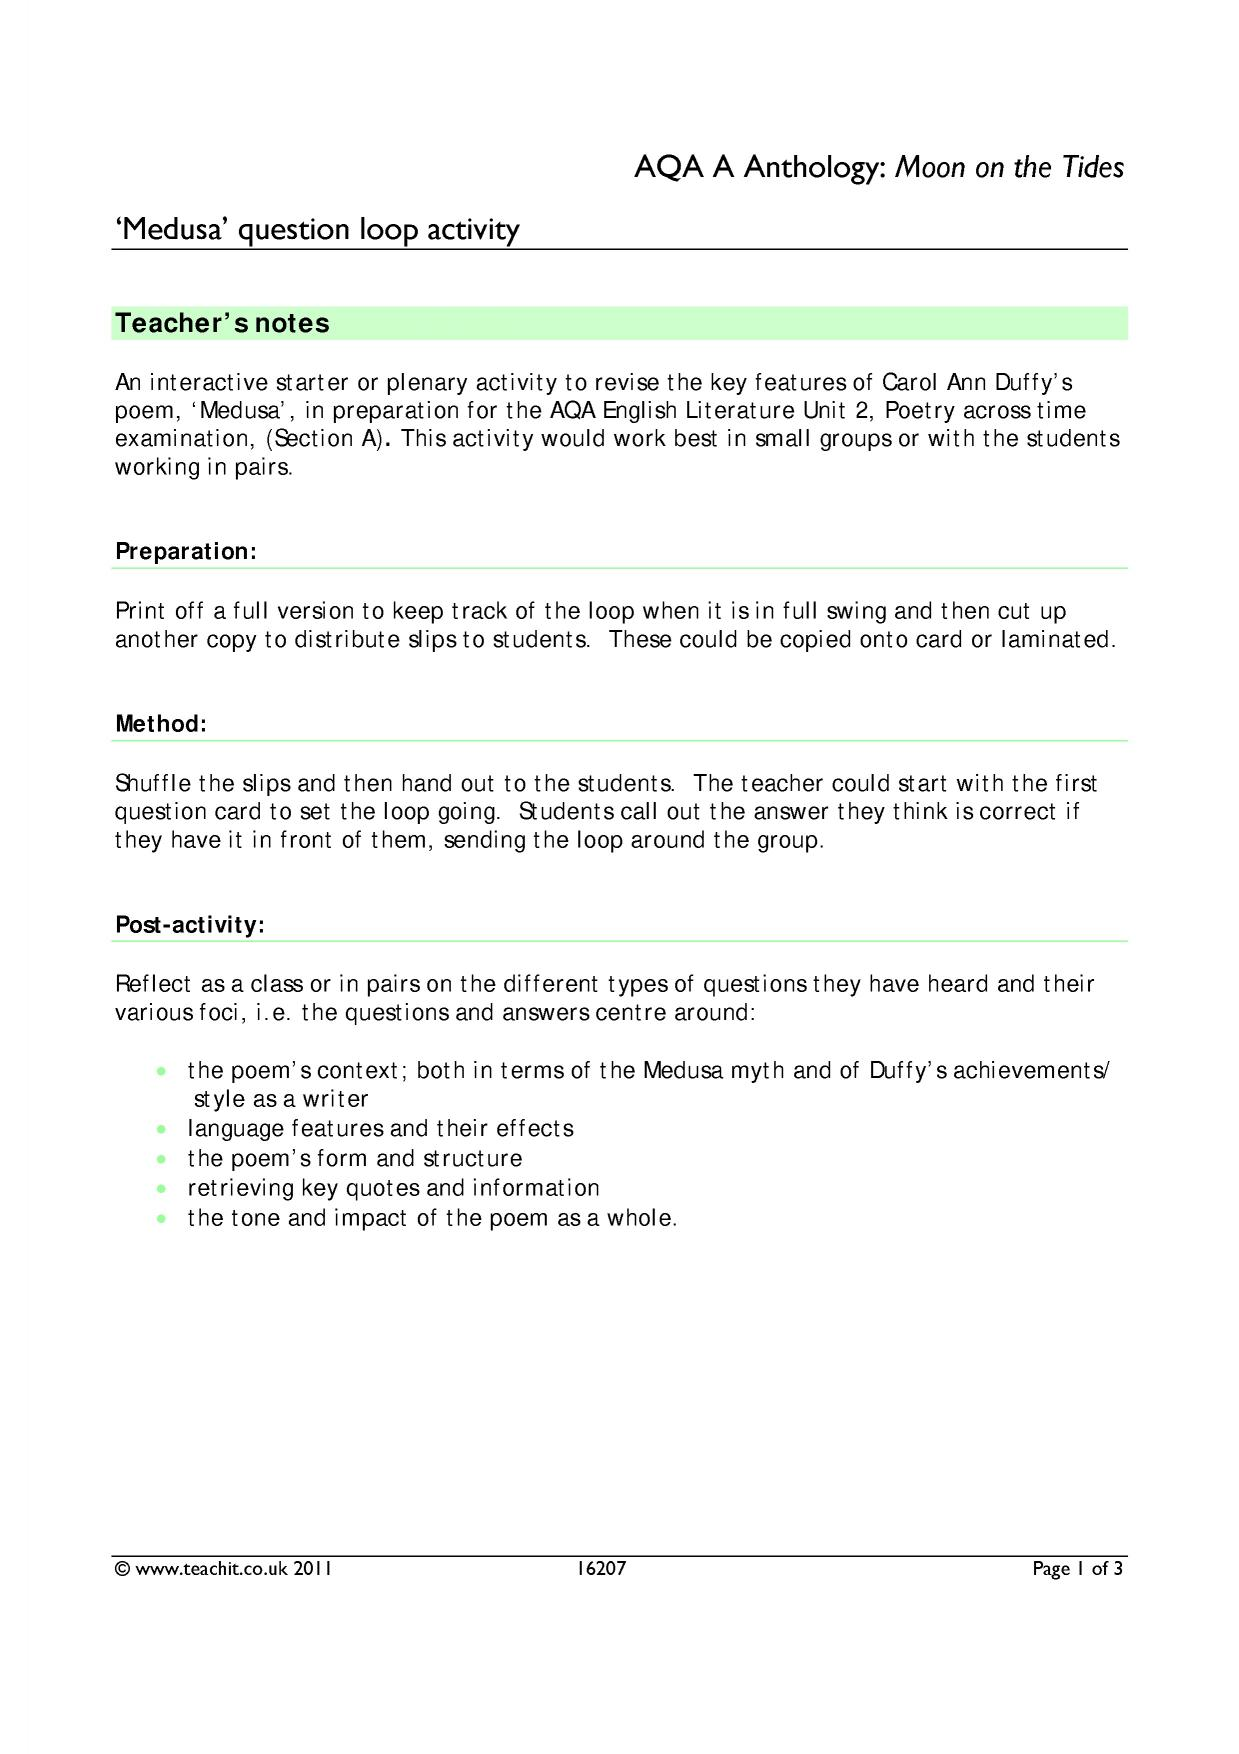 aqa english coursework specification Gcse aqa english: specification a (essentials of gcse aqa english) (essentials of gcse aqa english s)  aqa english gcse specification a: coursework file 4 jul .